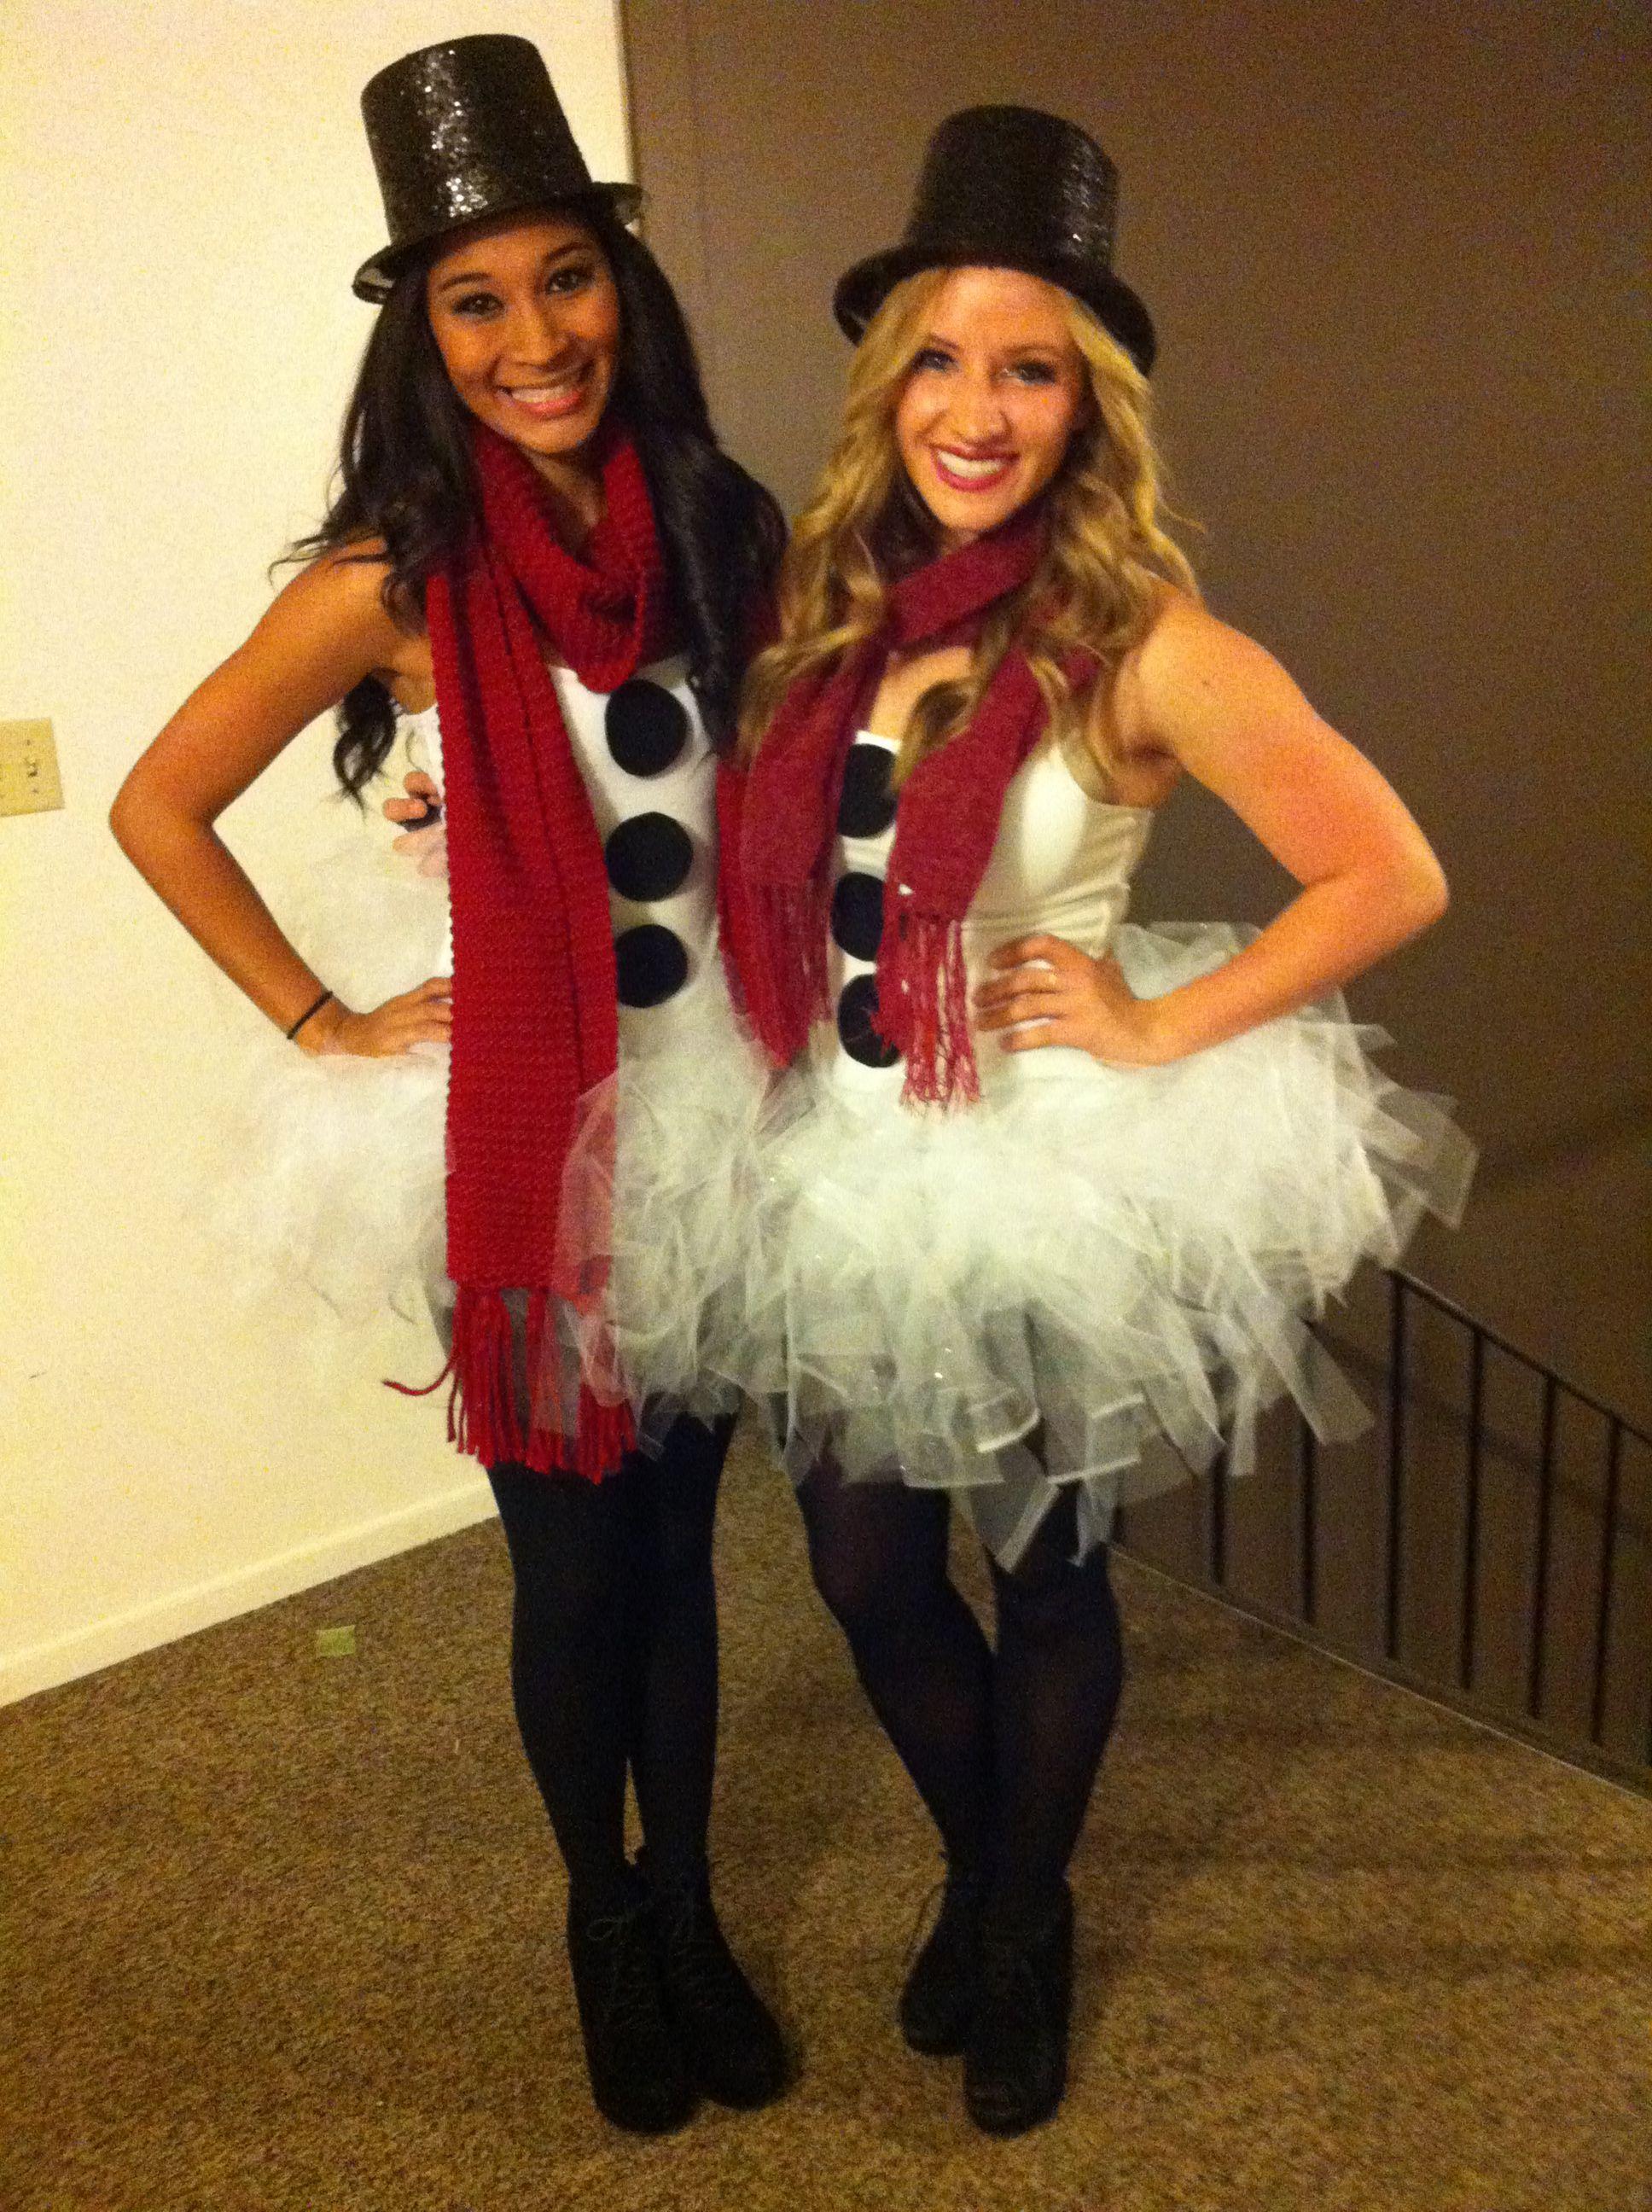 Christmas Halloween Costumes Diy.Last Minute Halloween Costumes Halloween Group Halloween